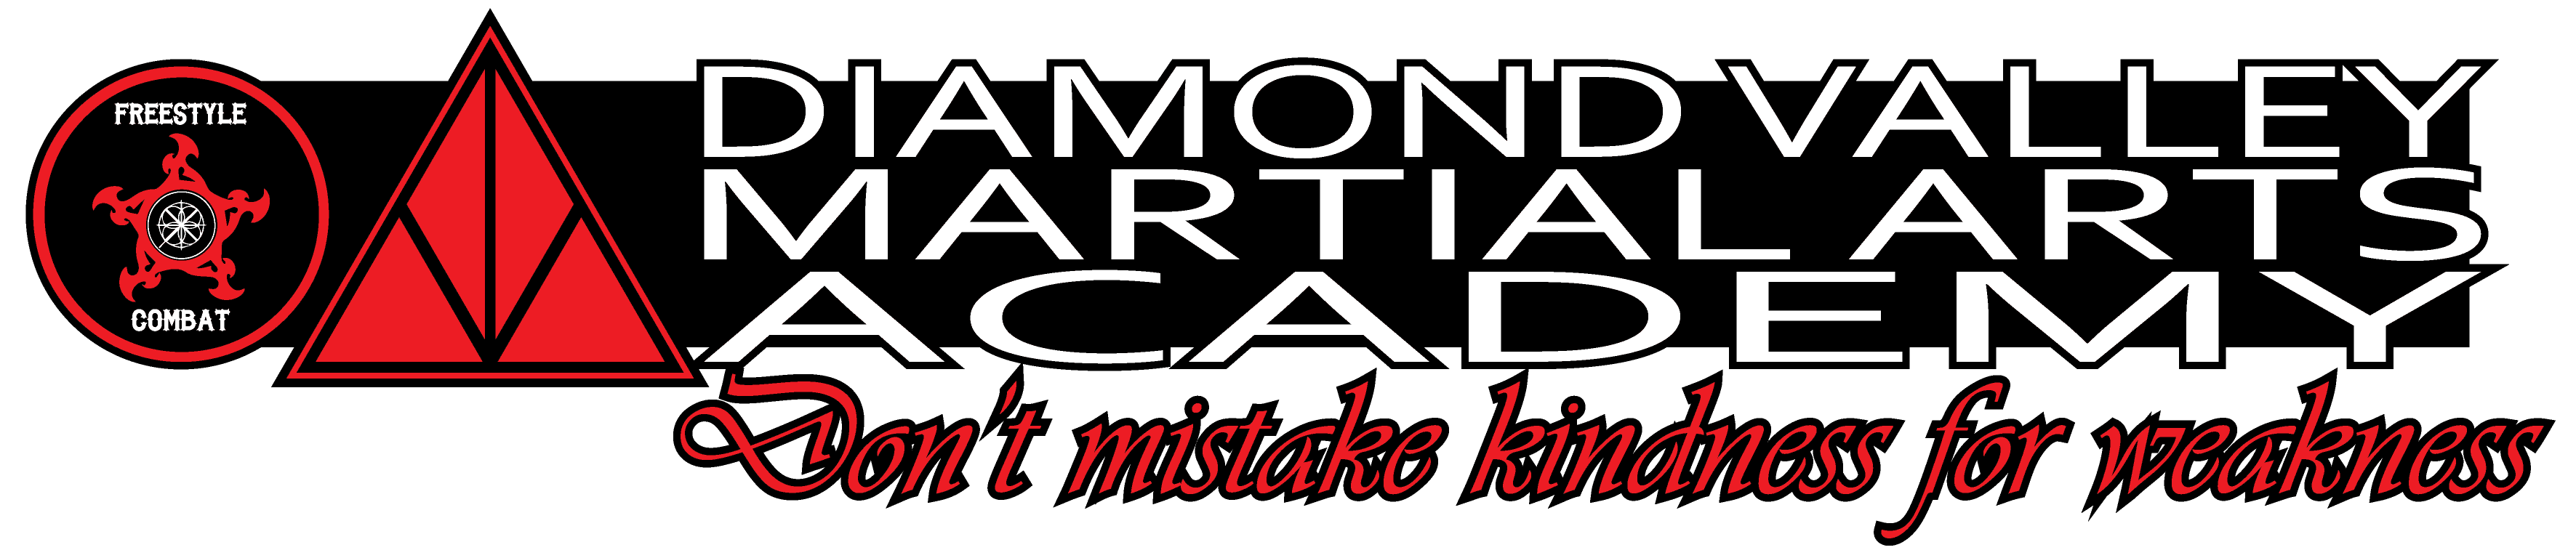 Diamond Valley Martial Arts Academy